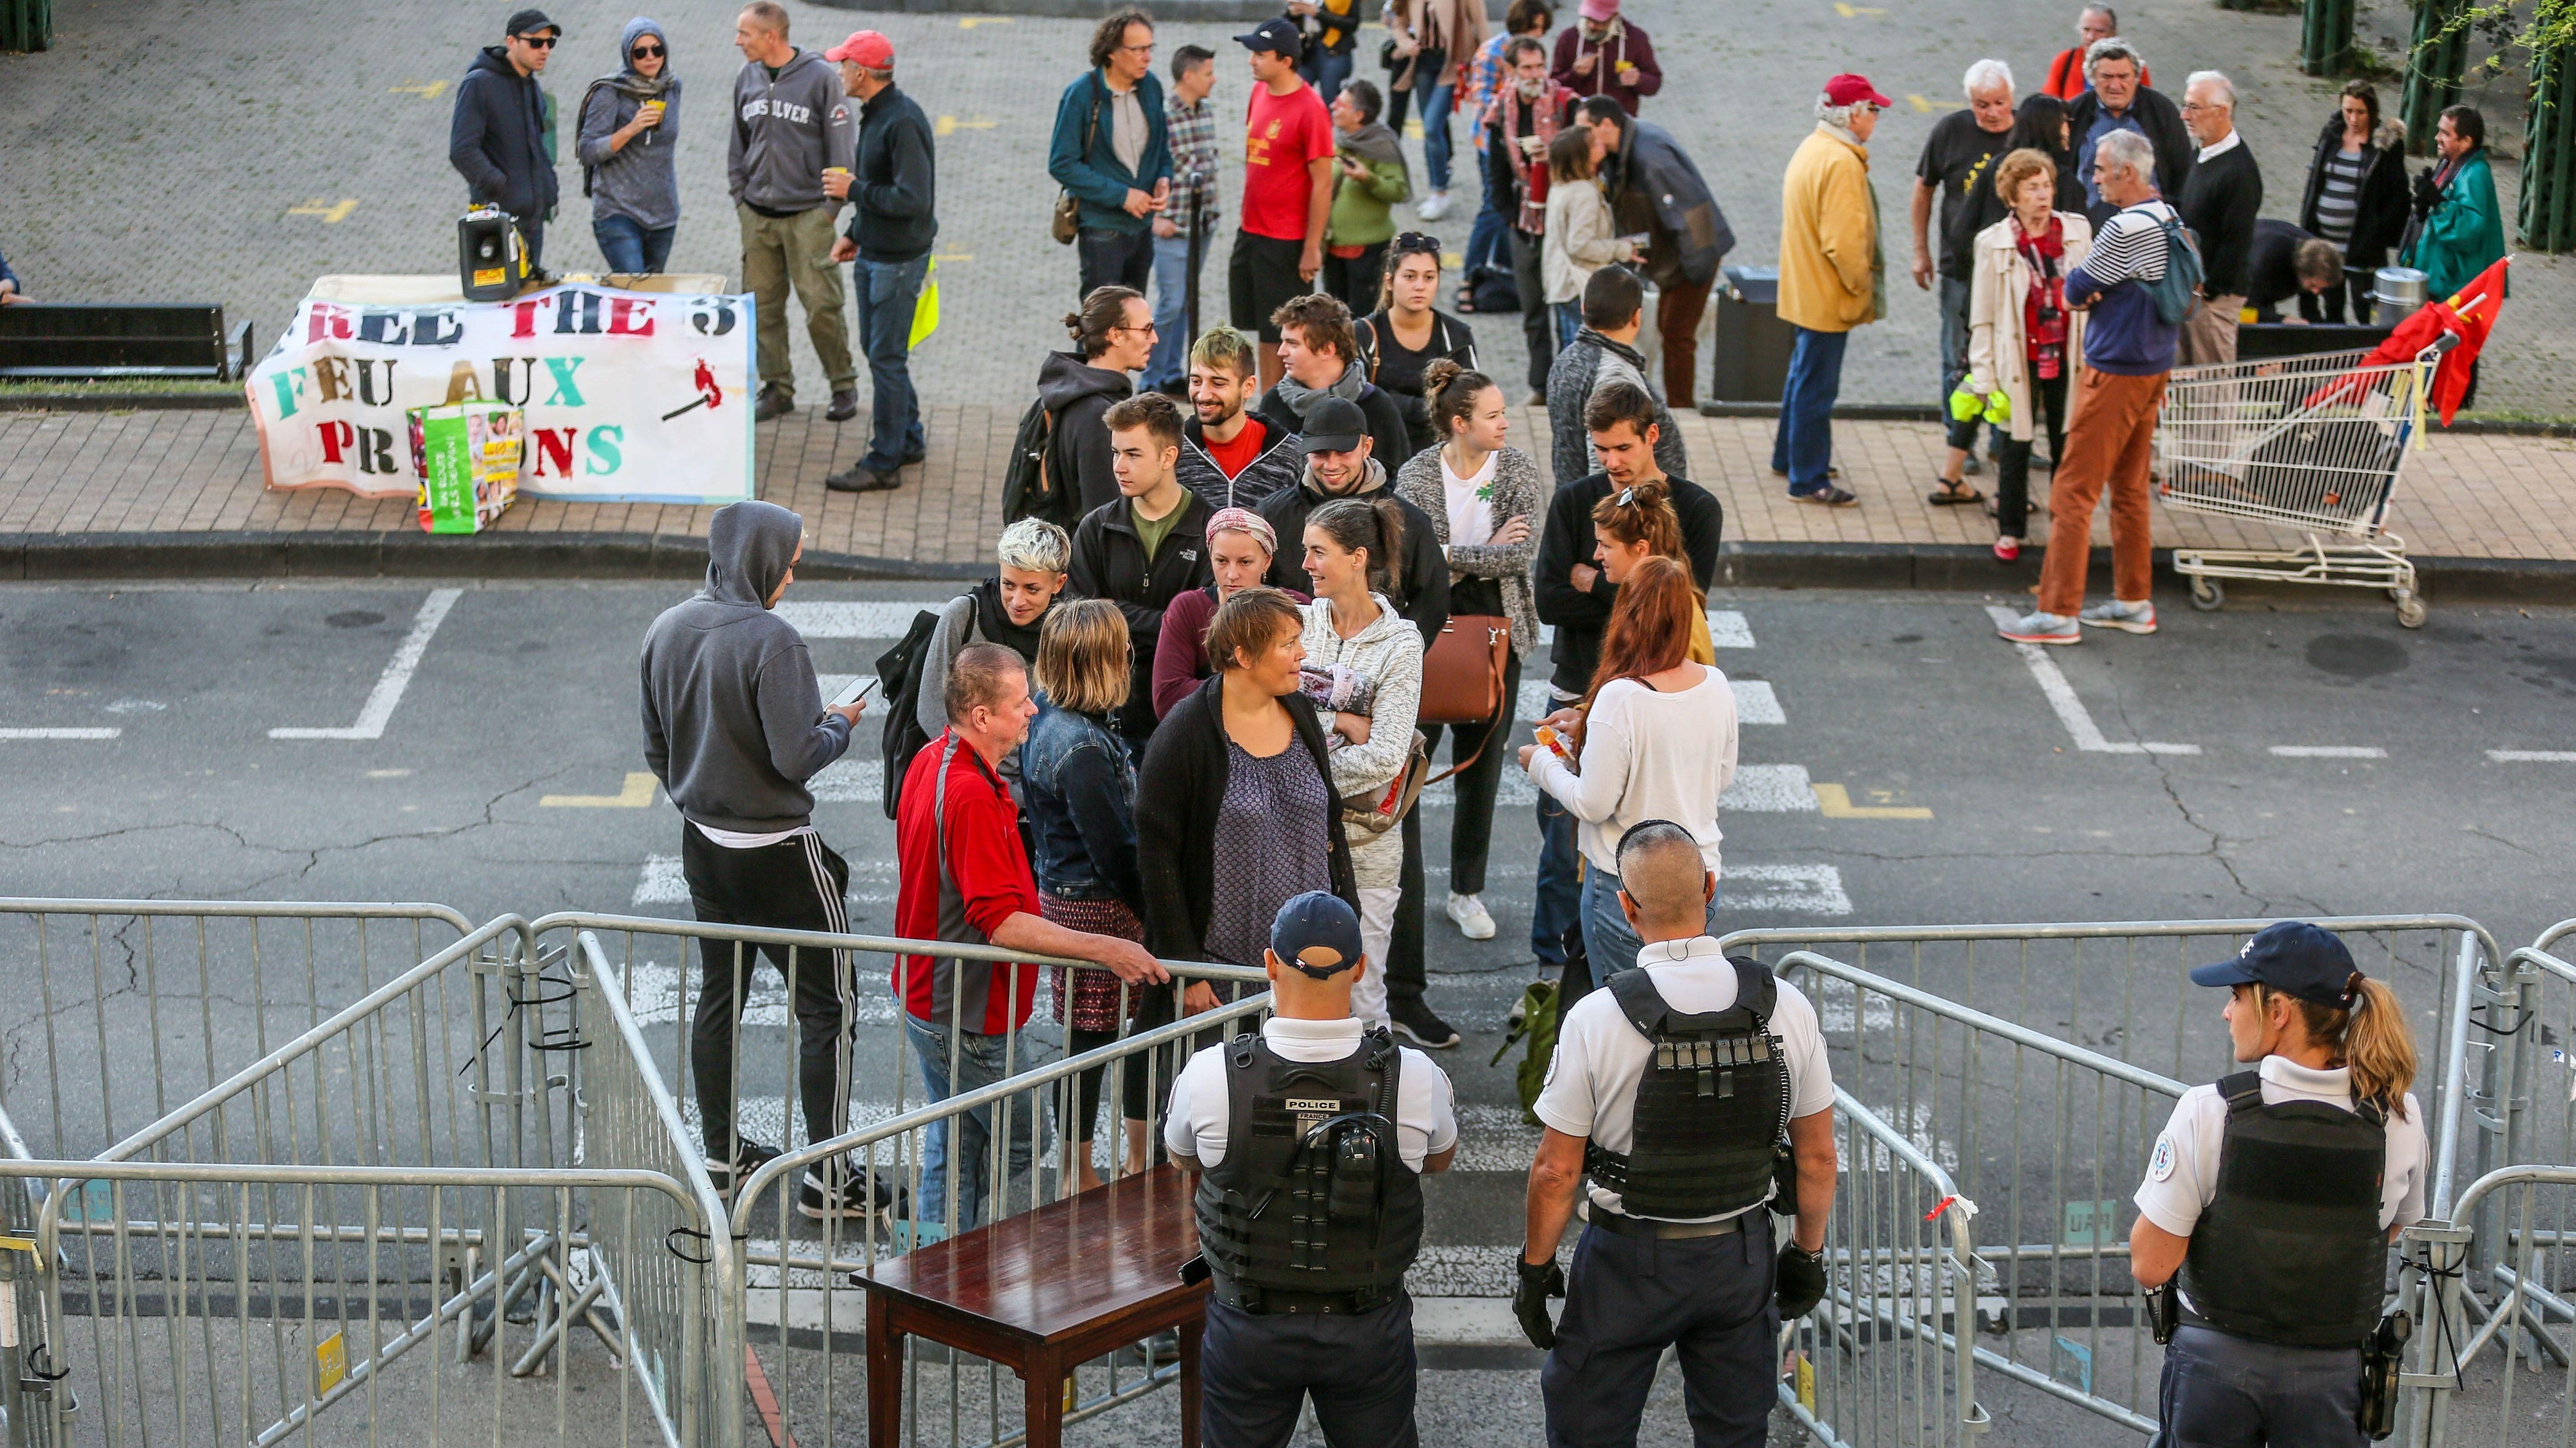 Proteste vor dem Gerichtsgebäude in Pau